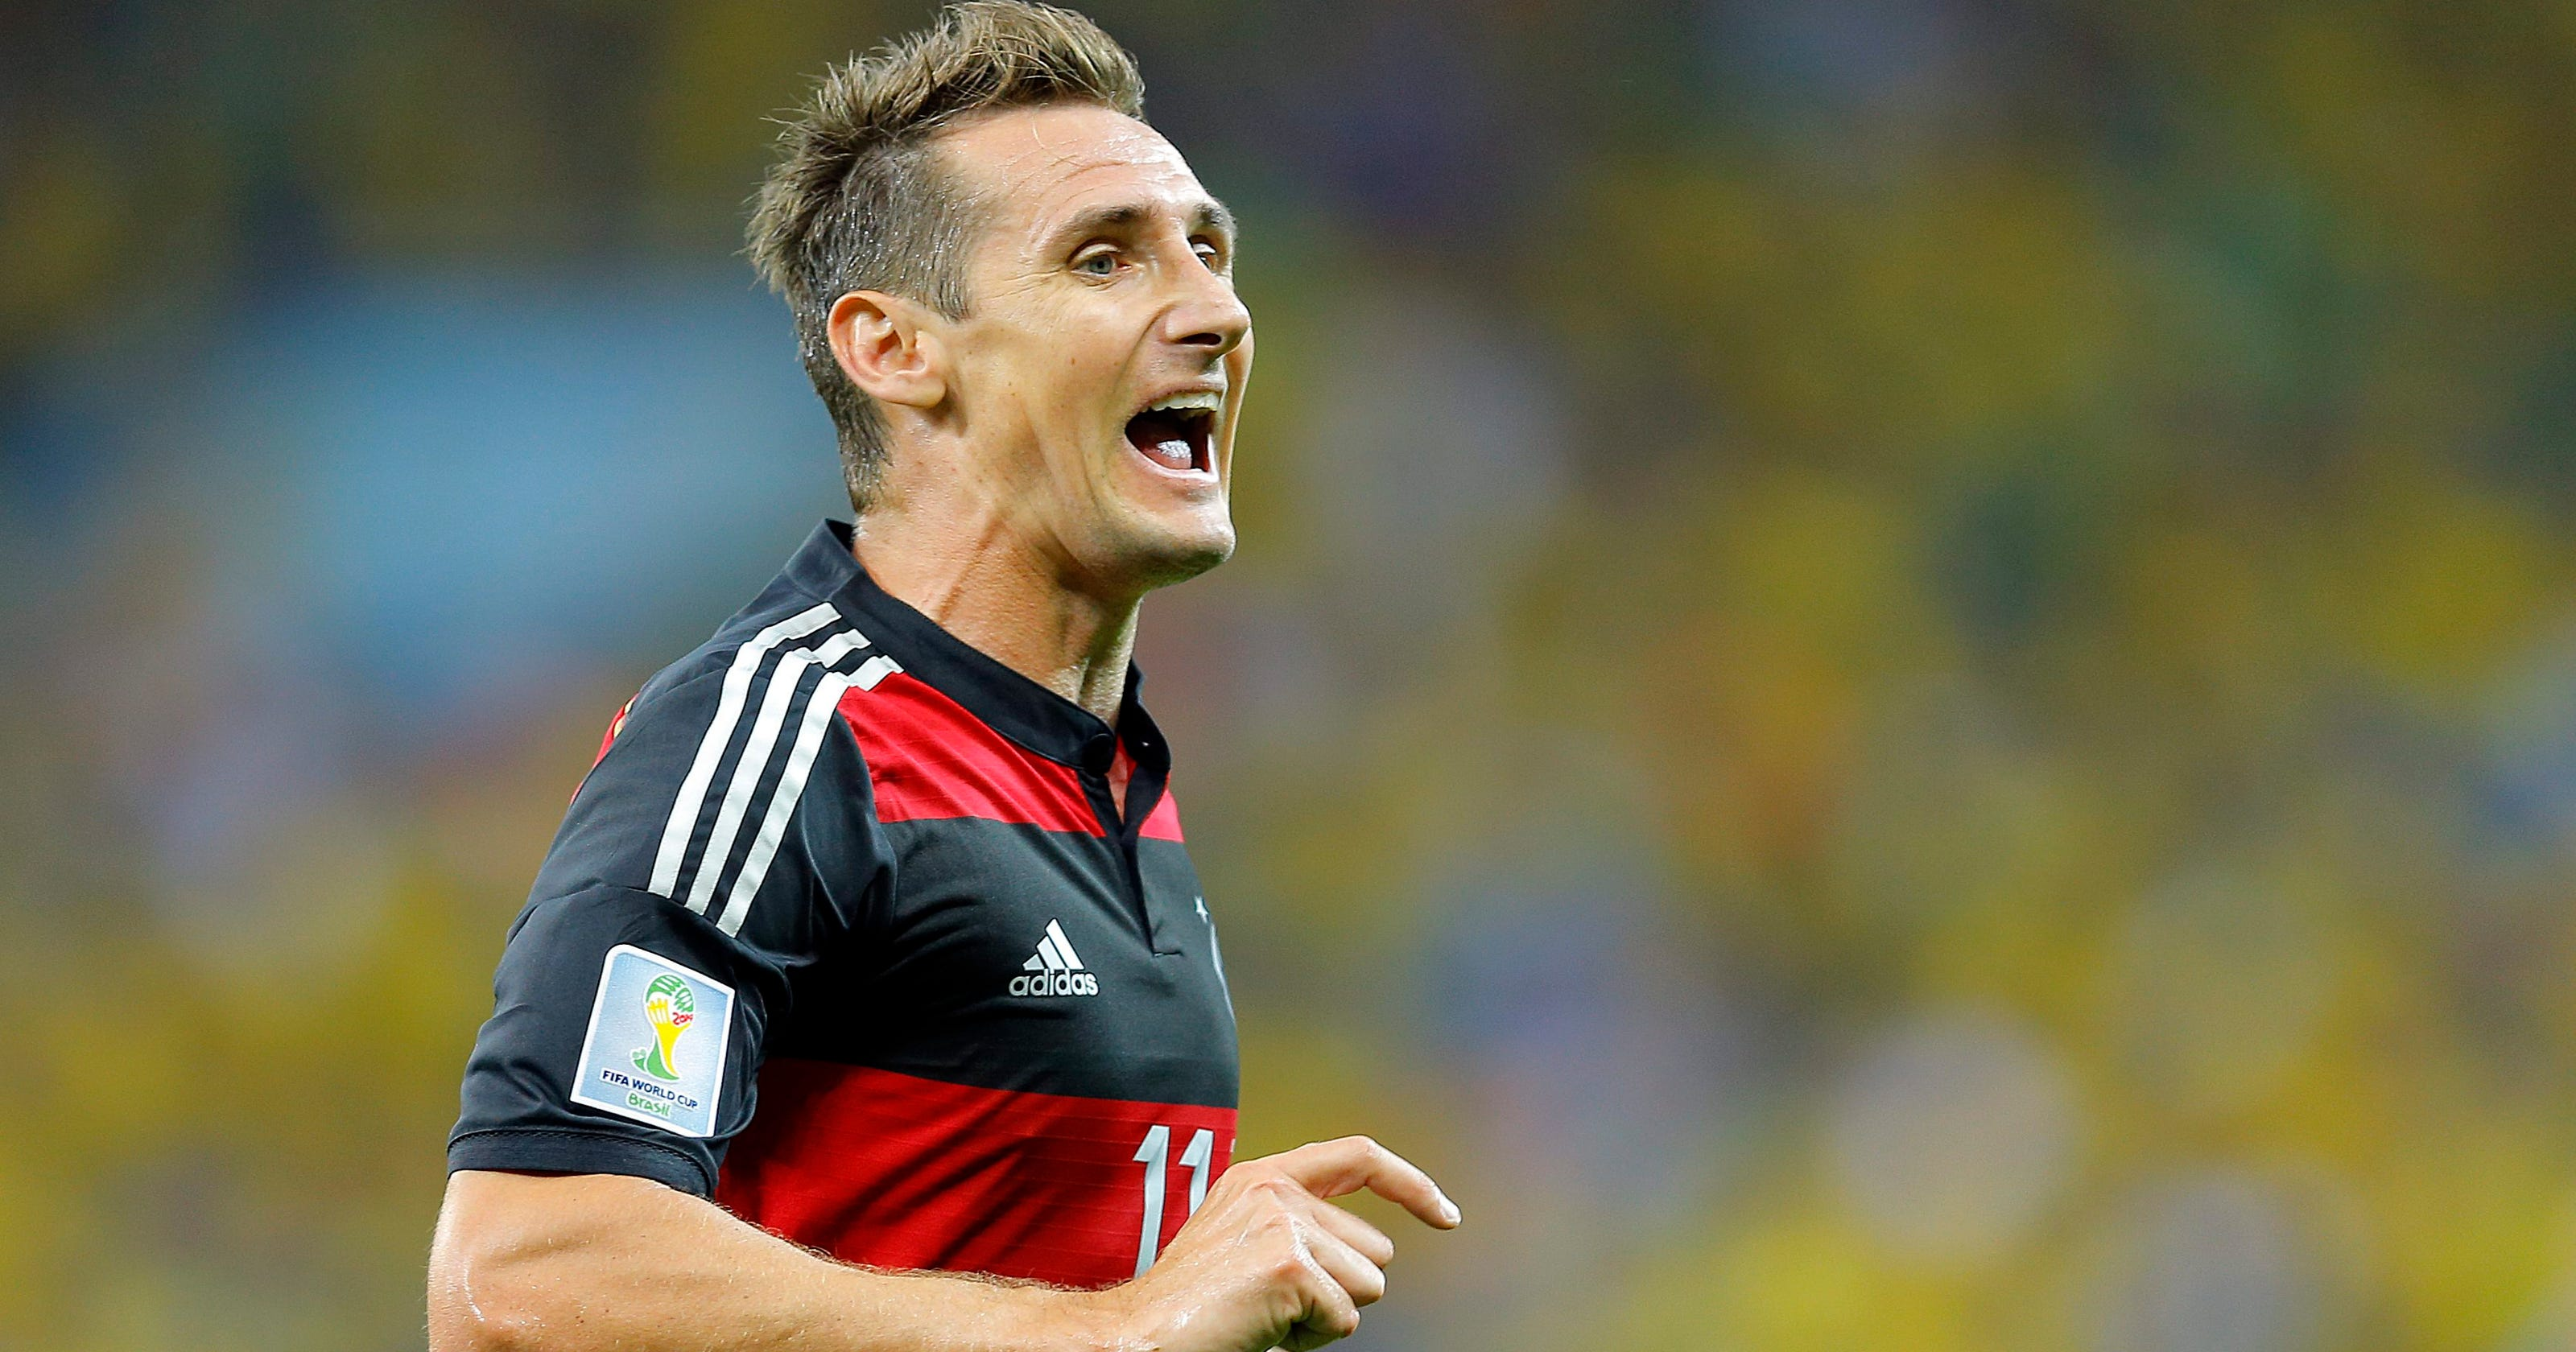 adce1e3c584 Miroslav Klose retires from Germany national team